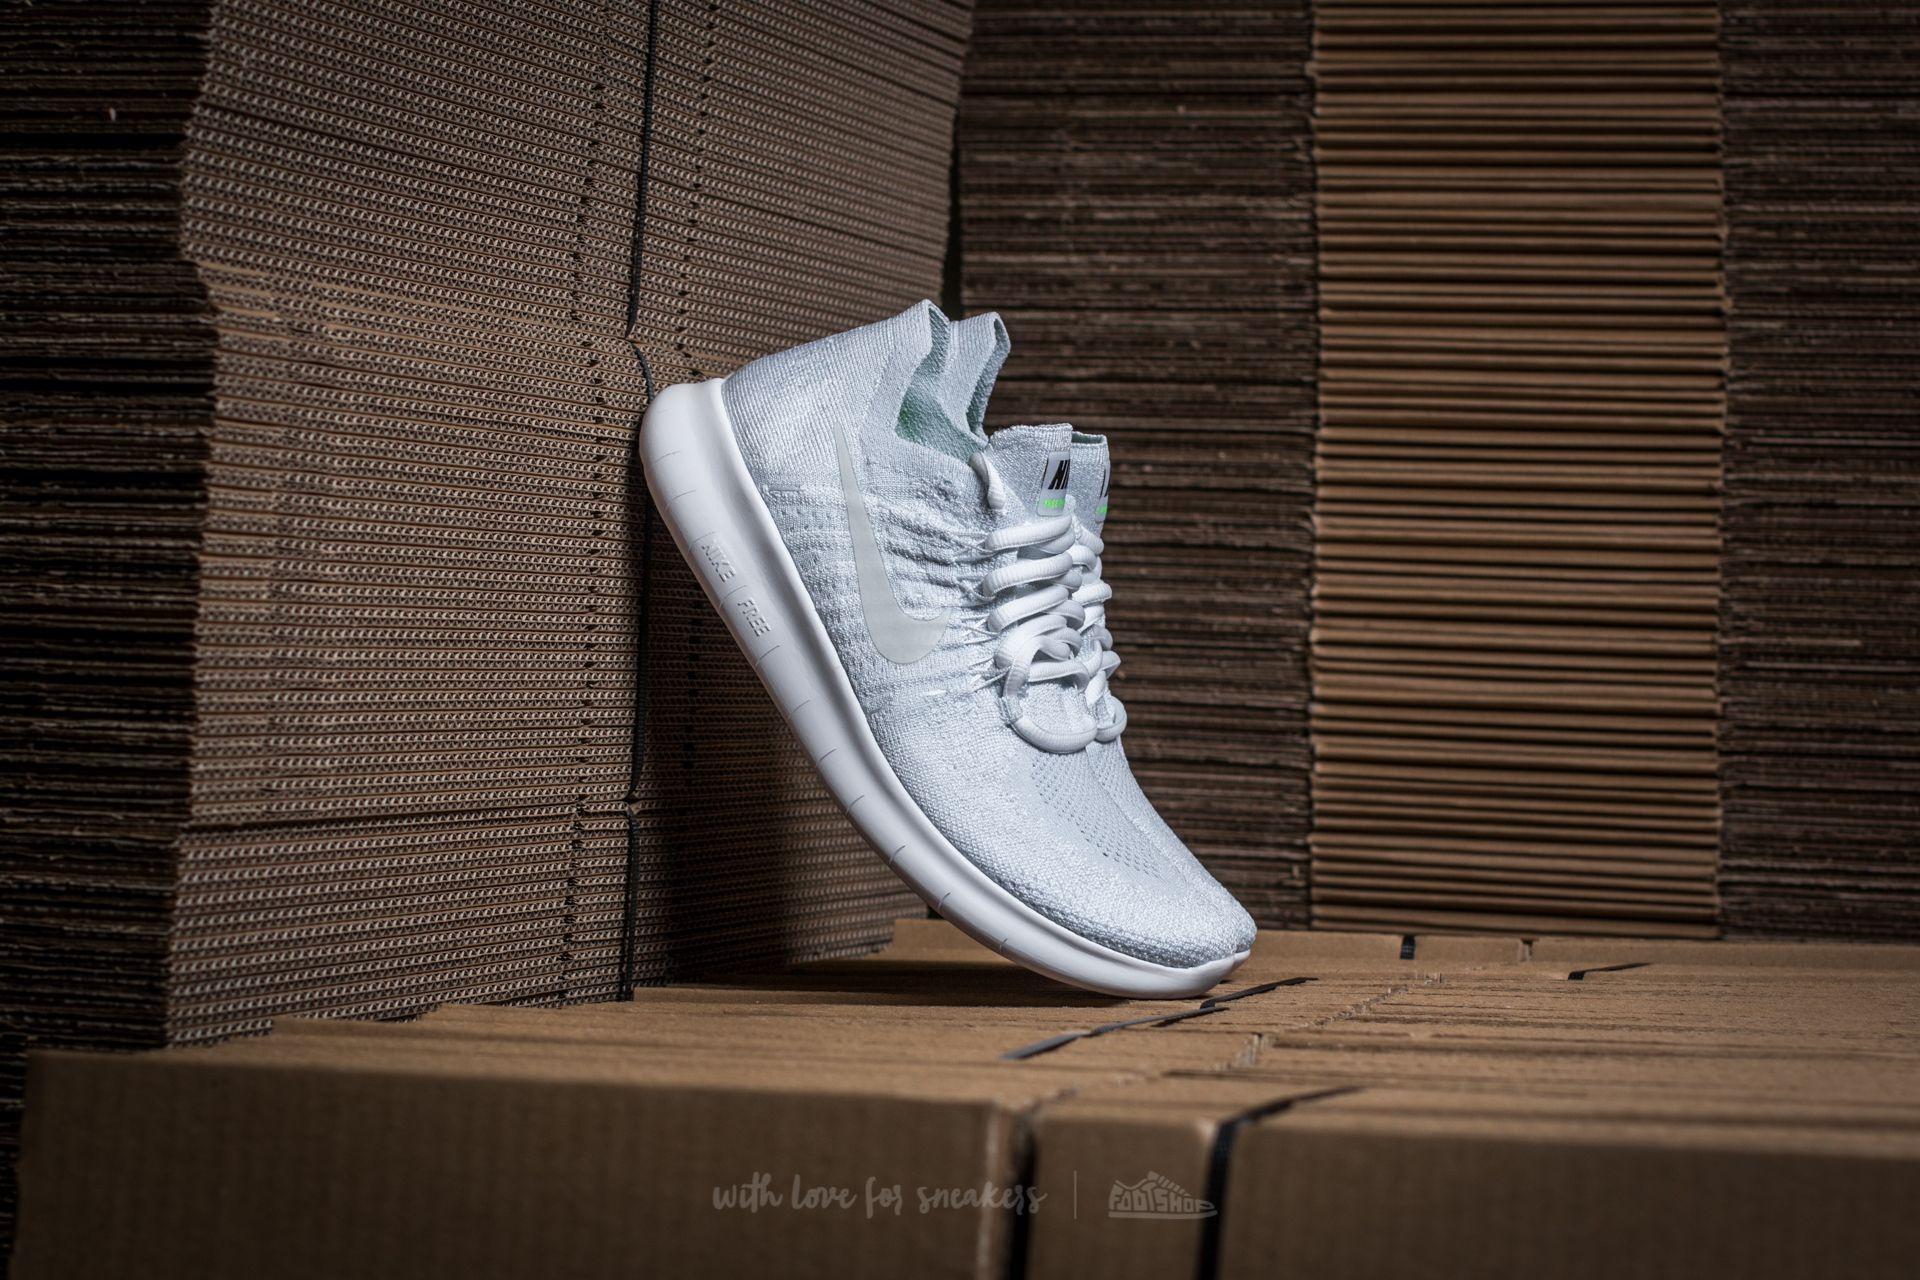 separation shoes 15780 ec91d Nike Wmns Free RN Flyknit 2017 White/ White-Pure Platinum | Footshop